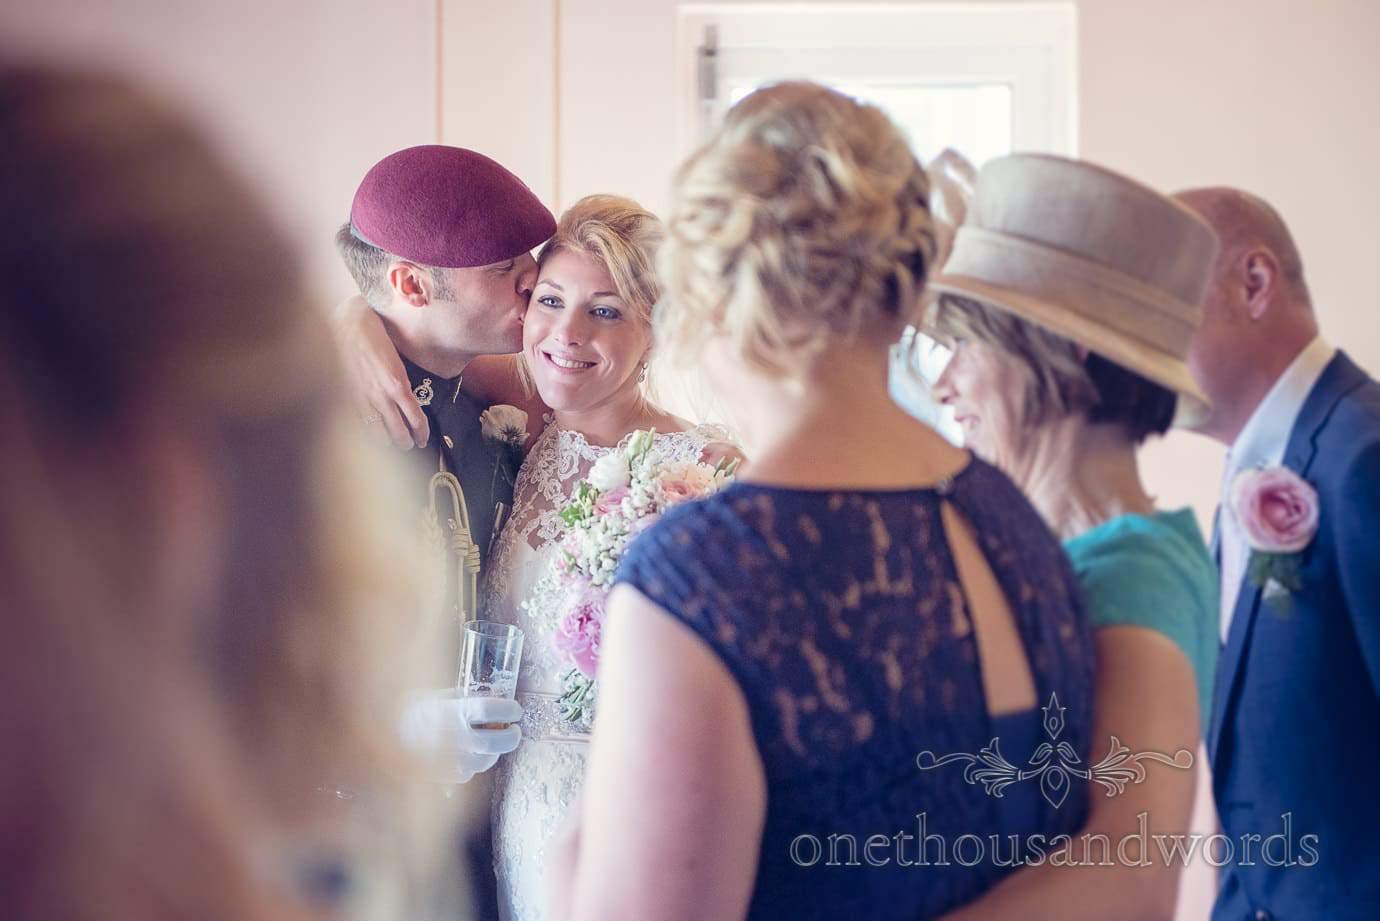 Groom kisses bride as wedding party waits for wedding breakfast